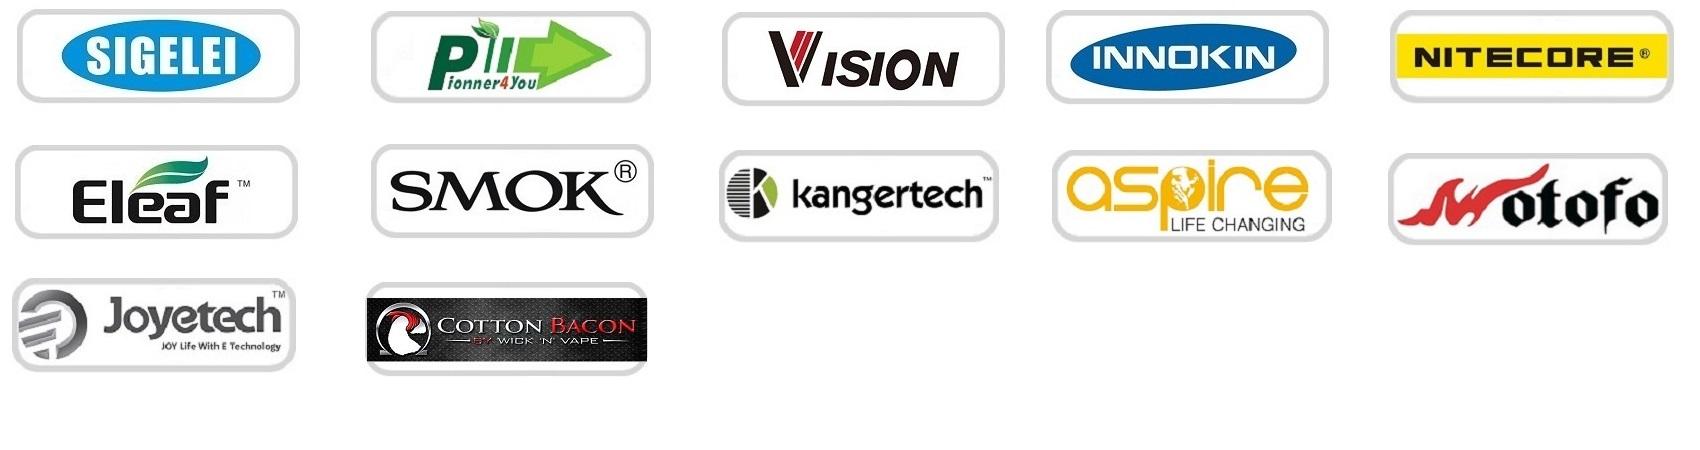 Best Ecig Vape Company Brands